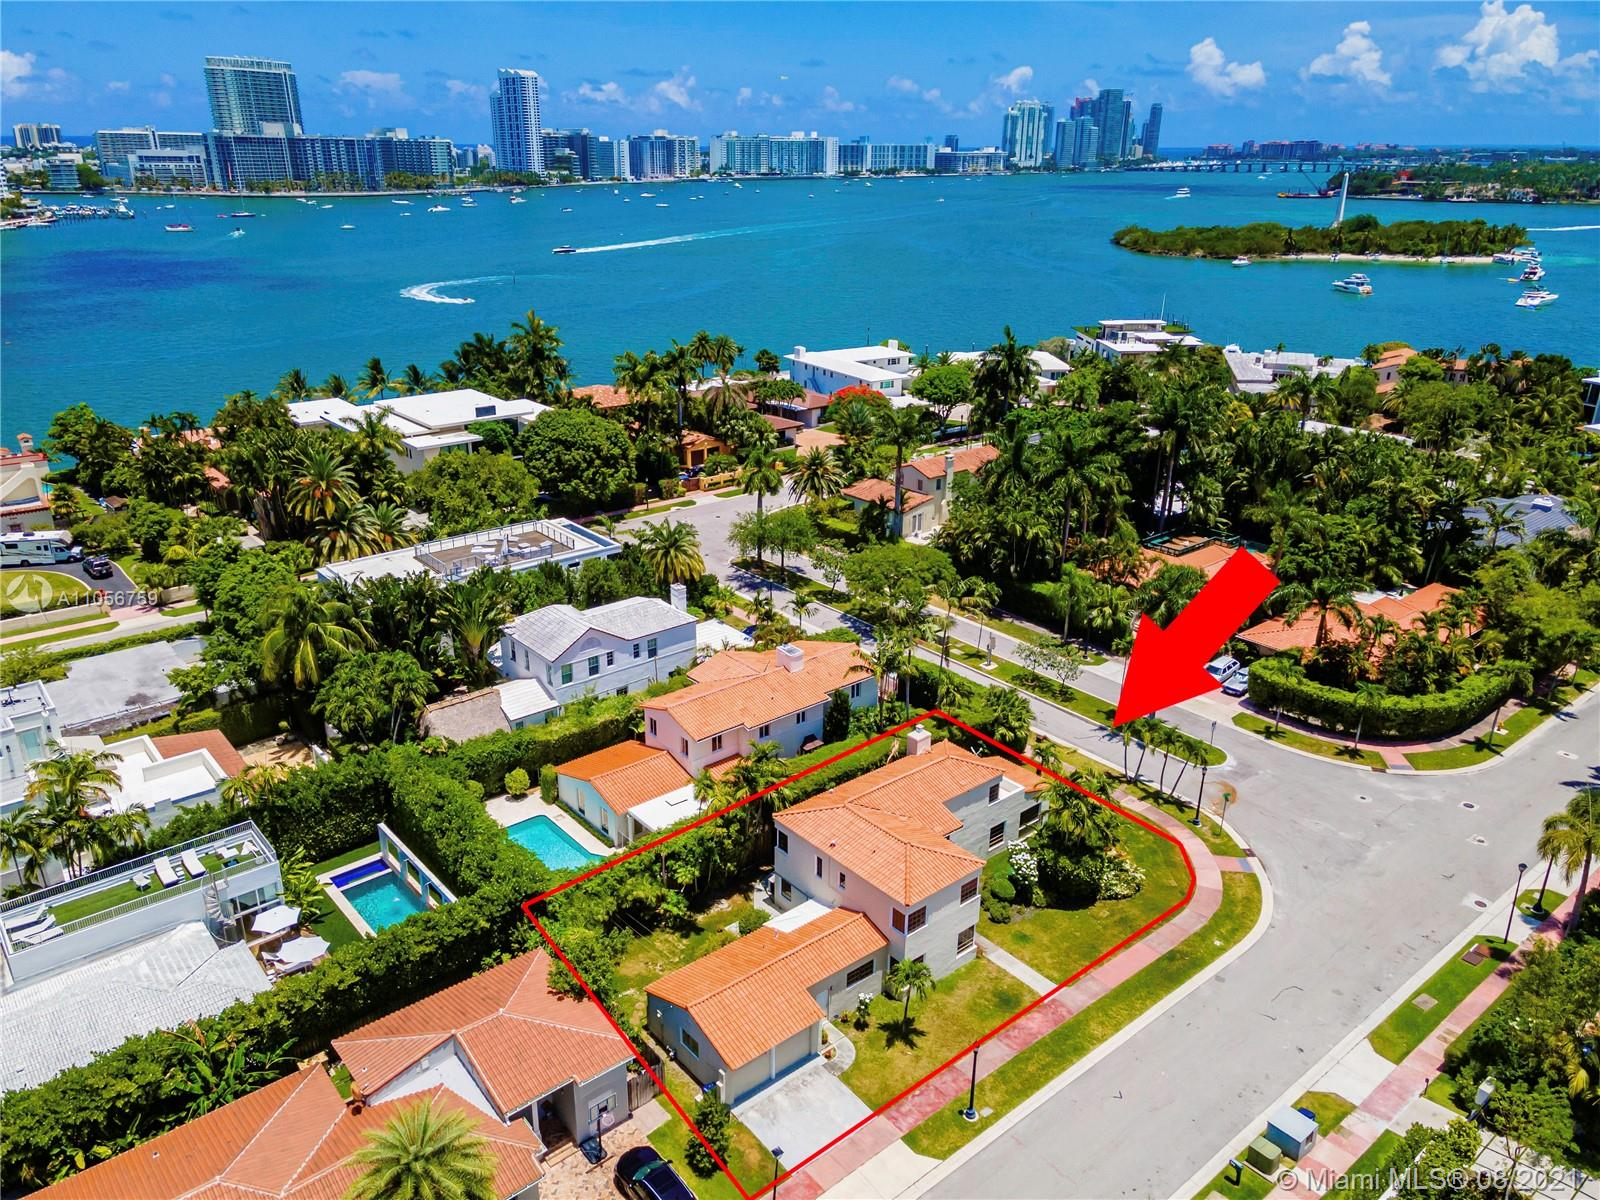 107 Rivo Alto Dr, Miami Beach, Florida 33139